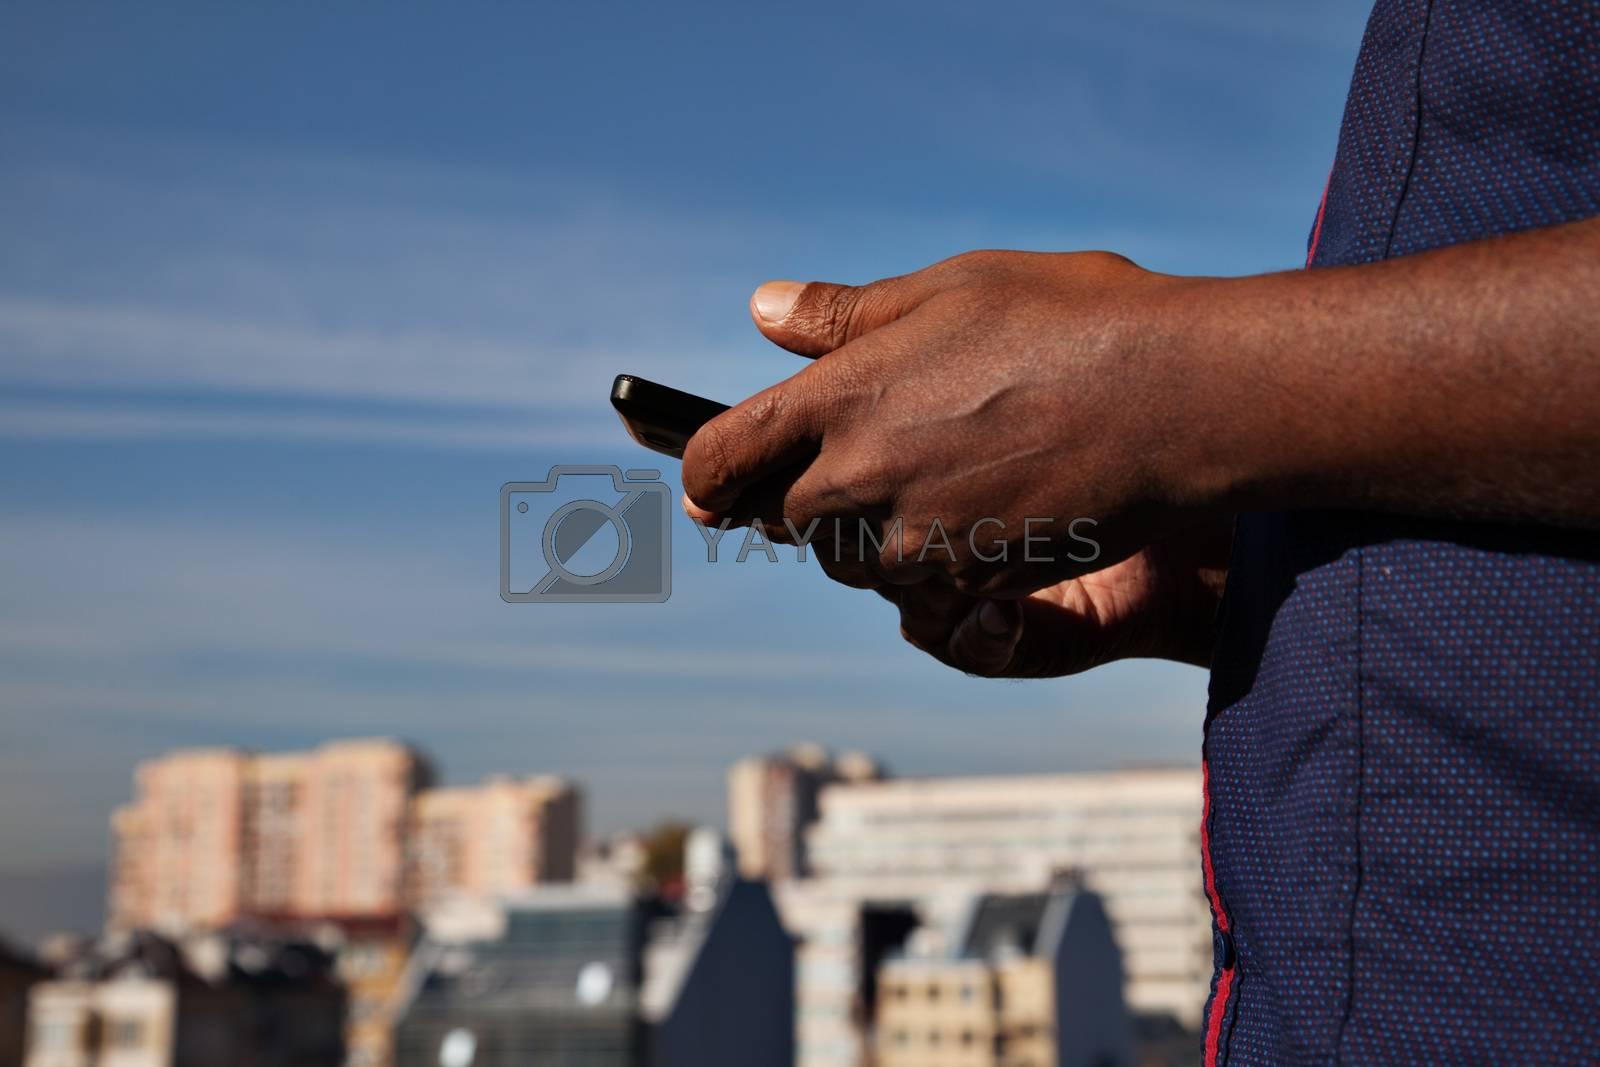 black man's hands holding phone above a cityline